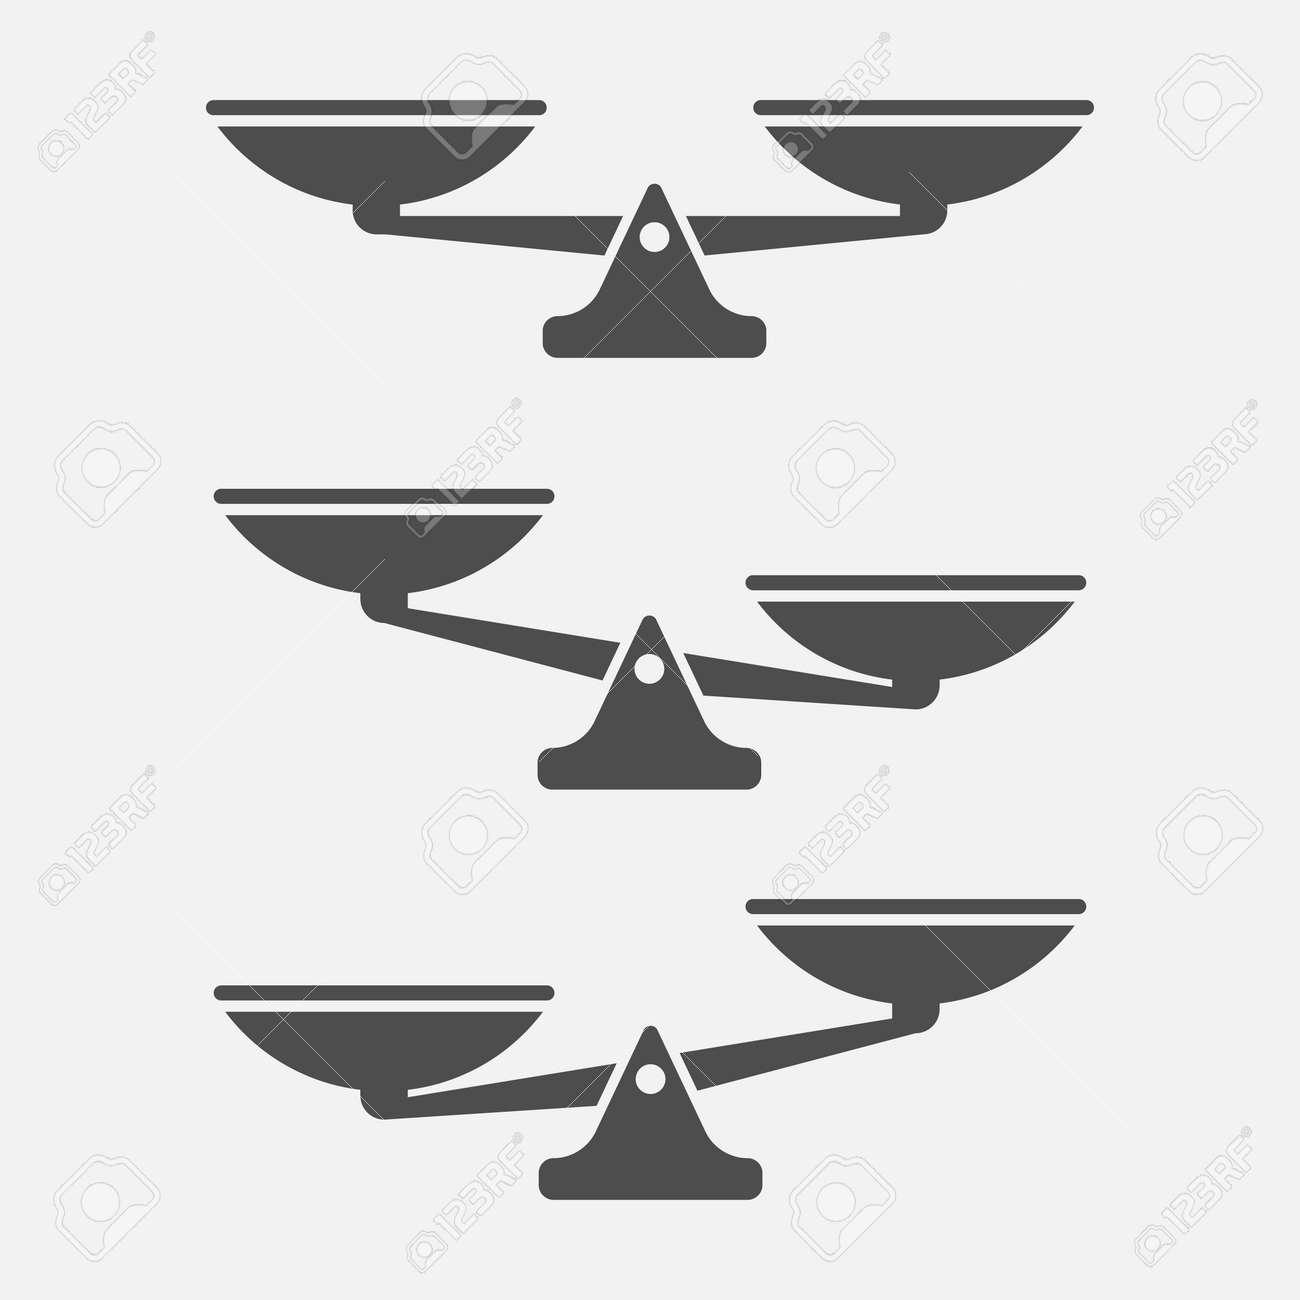 Set of scales balance isolated on white background. Vector illustration. Eps 10. - 108118732